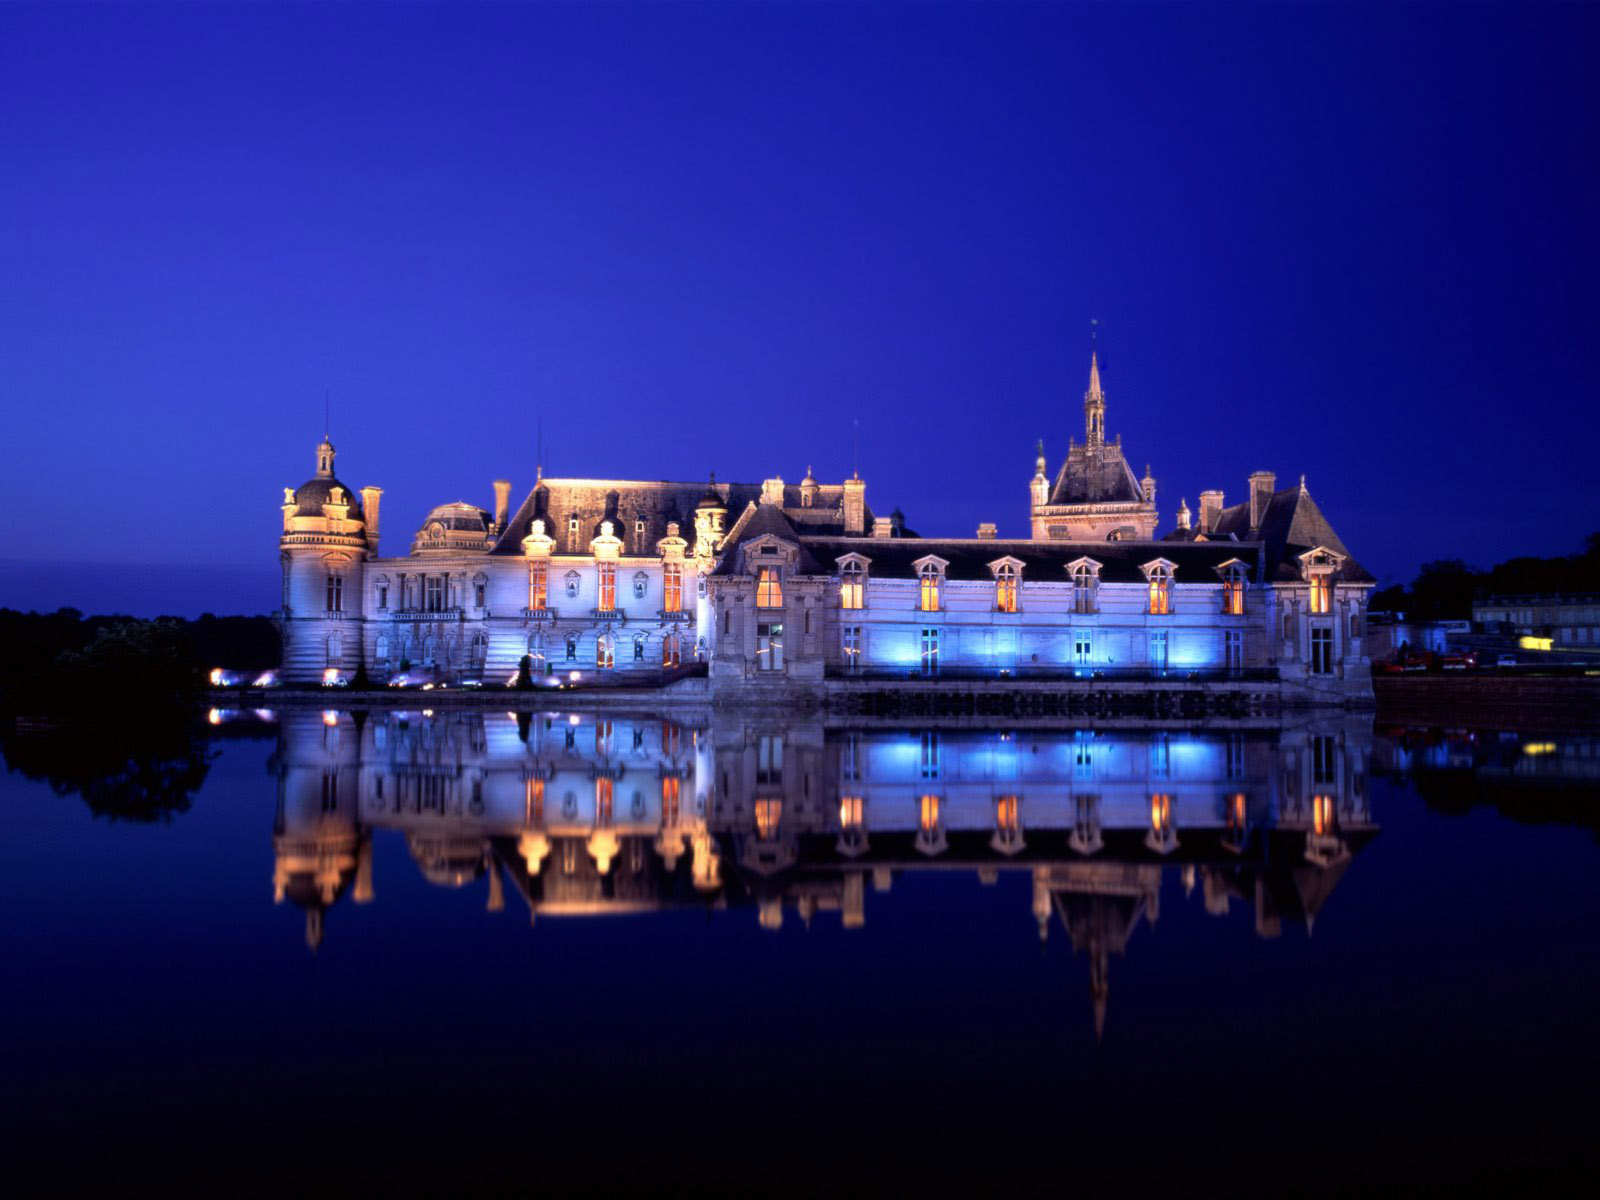 Chateau de Chantilly France wallpaper